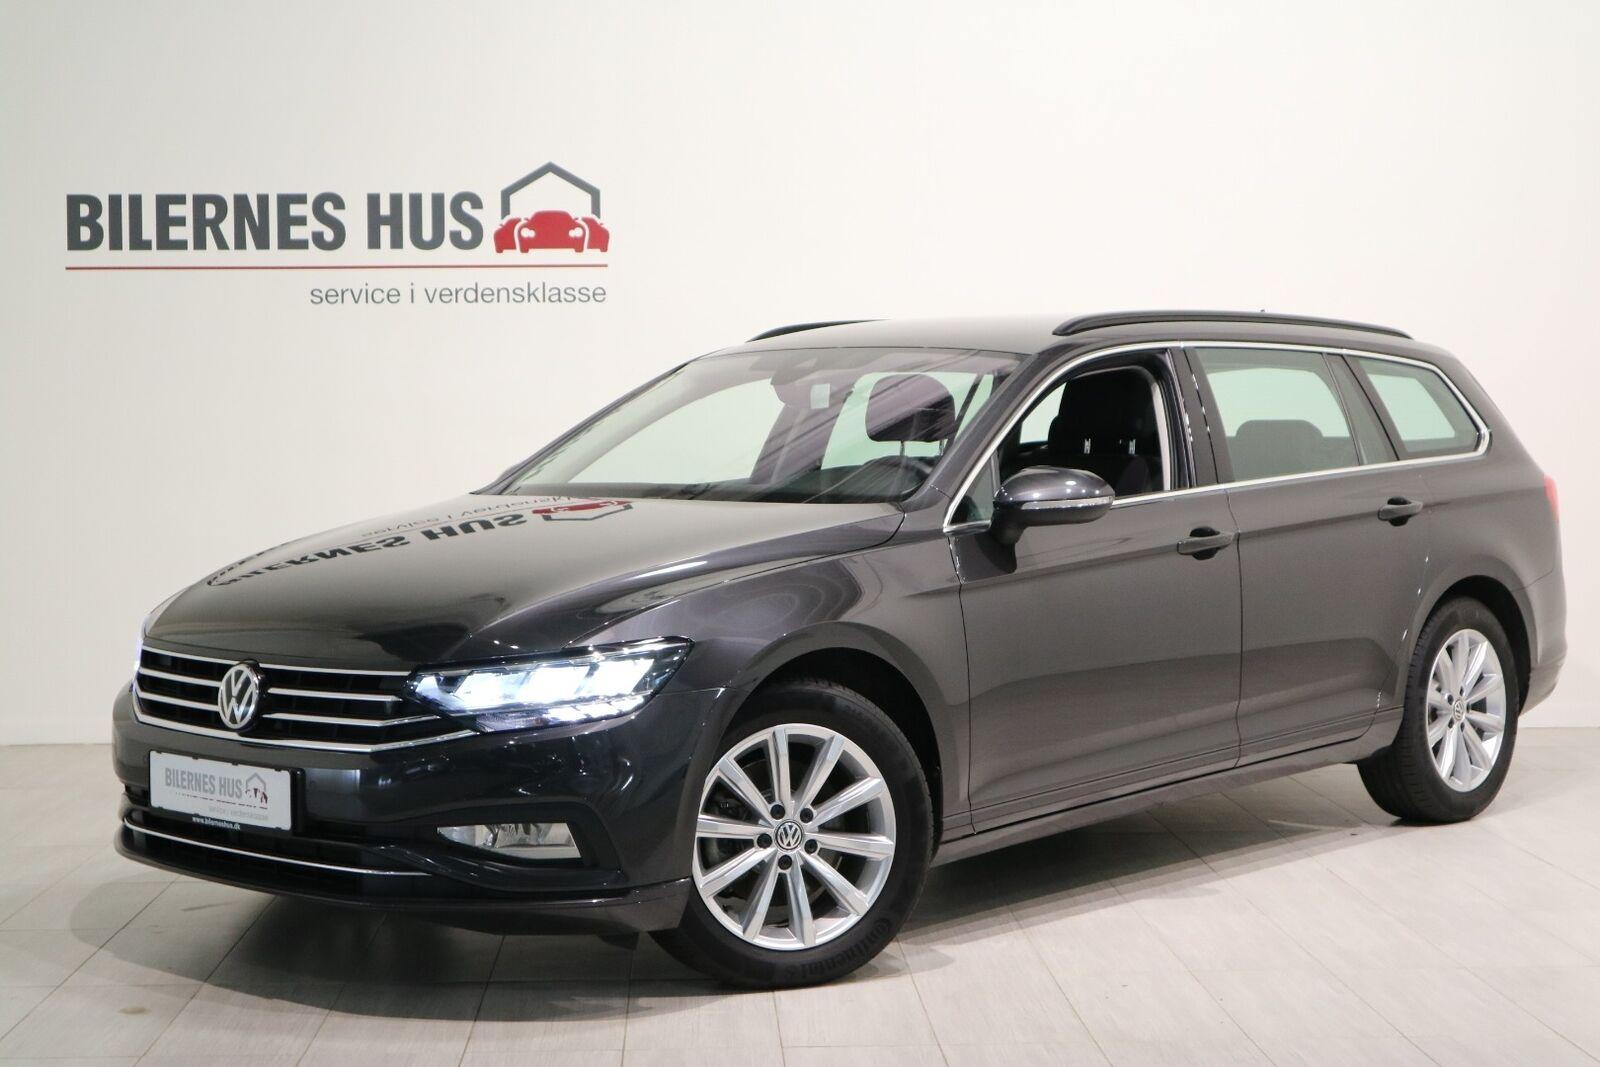 VW Passat 2,0 TDi 150 Business+ Variant DSG